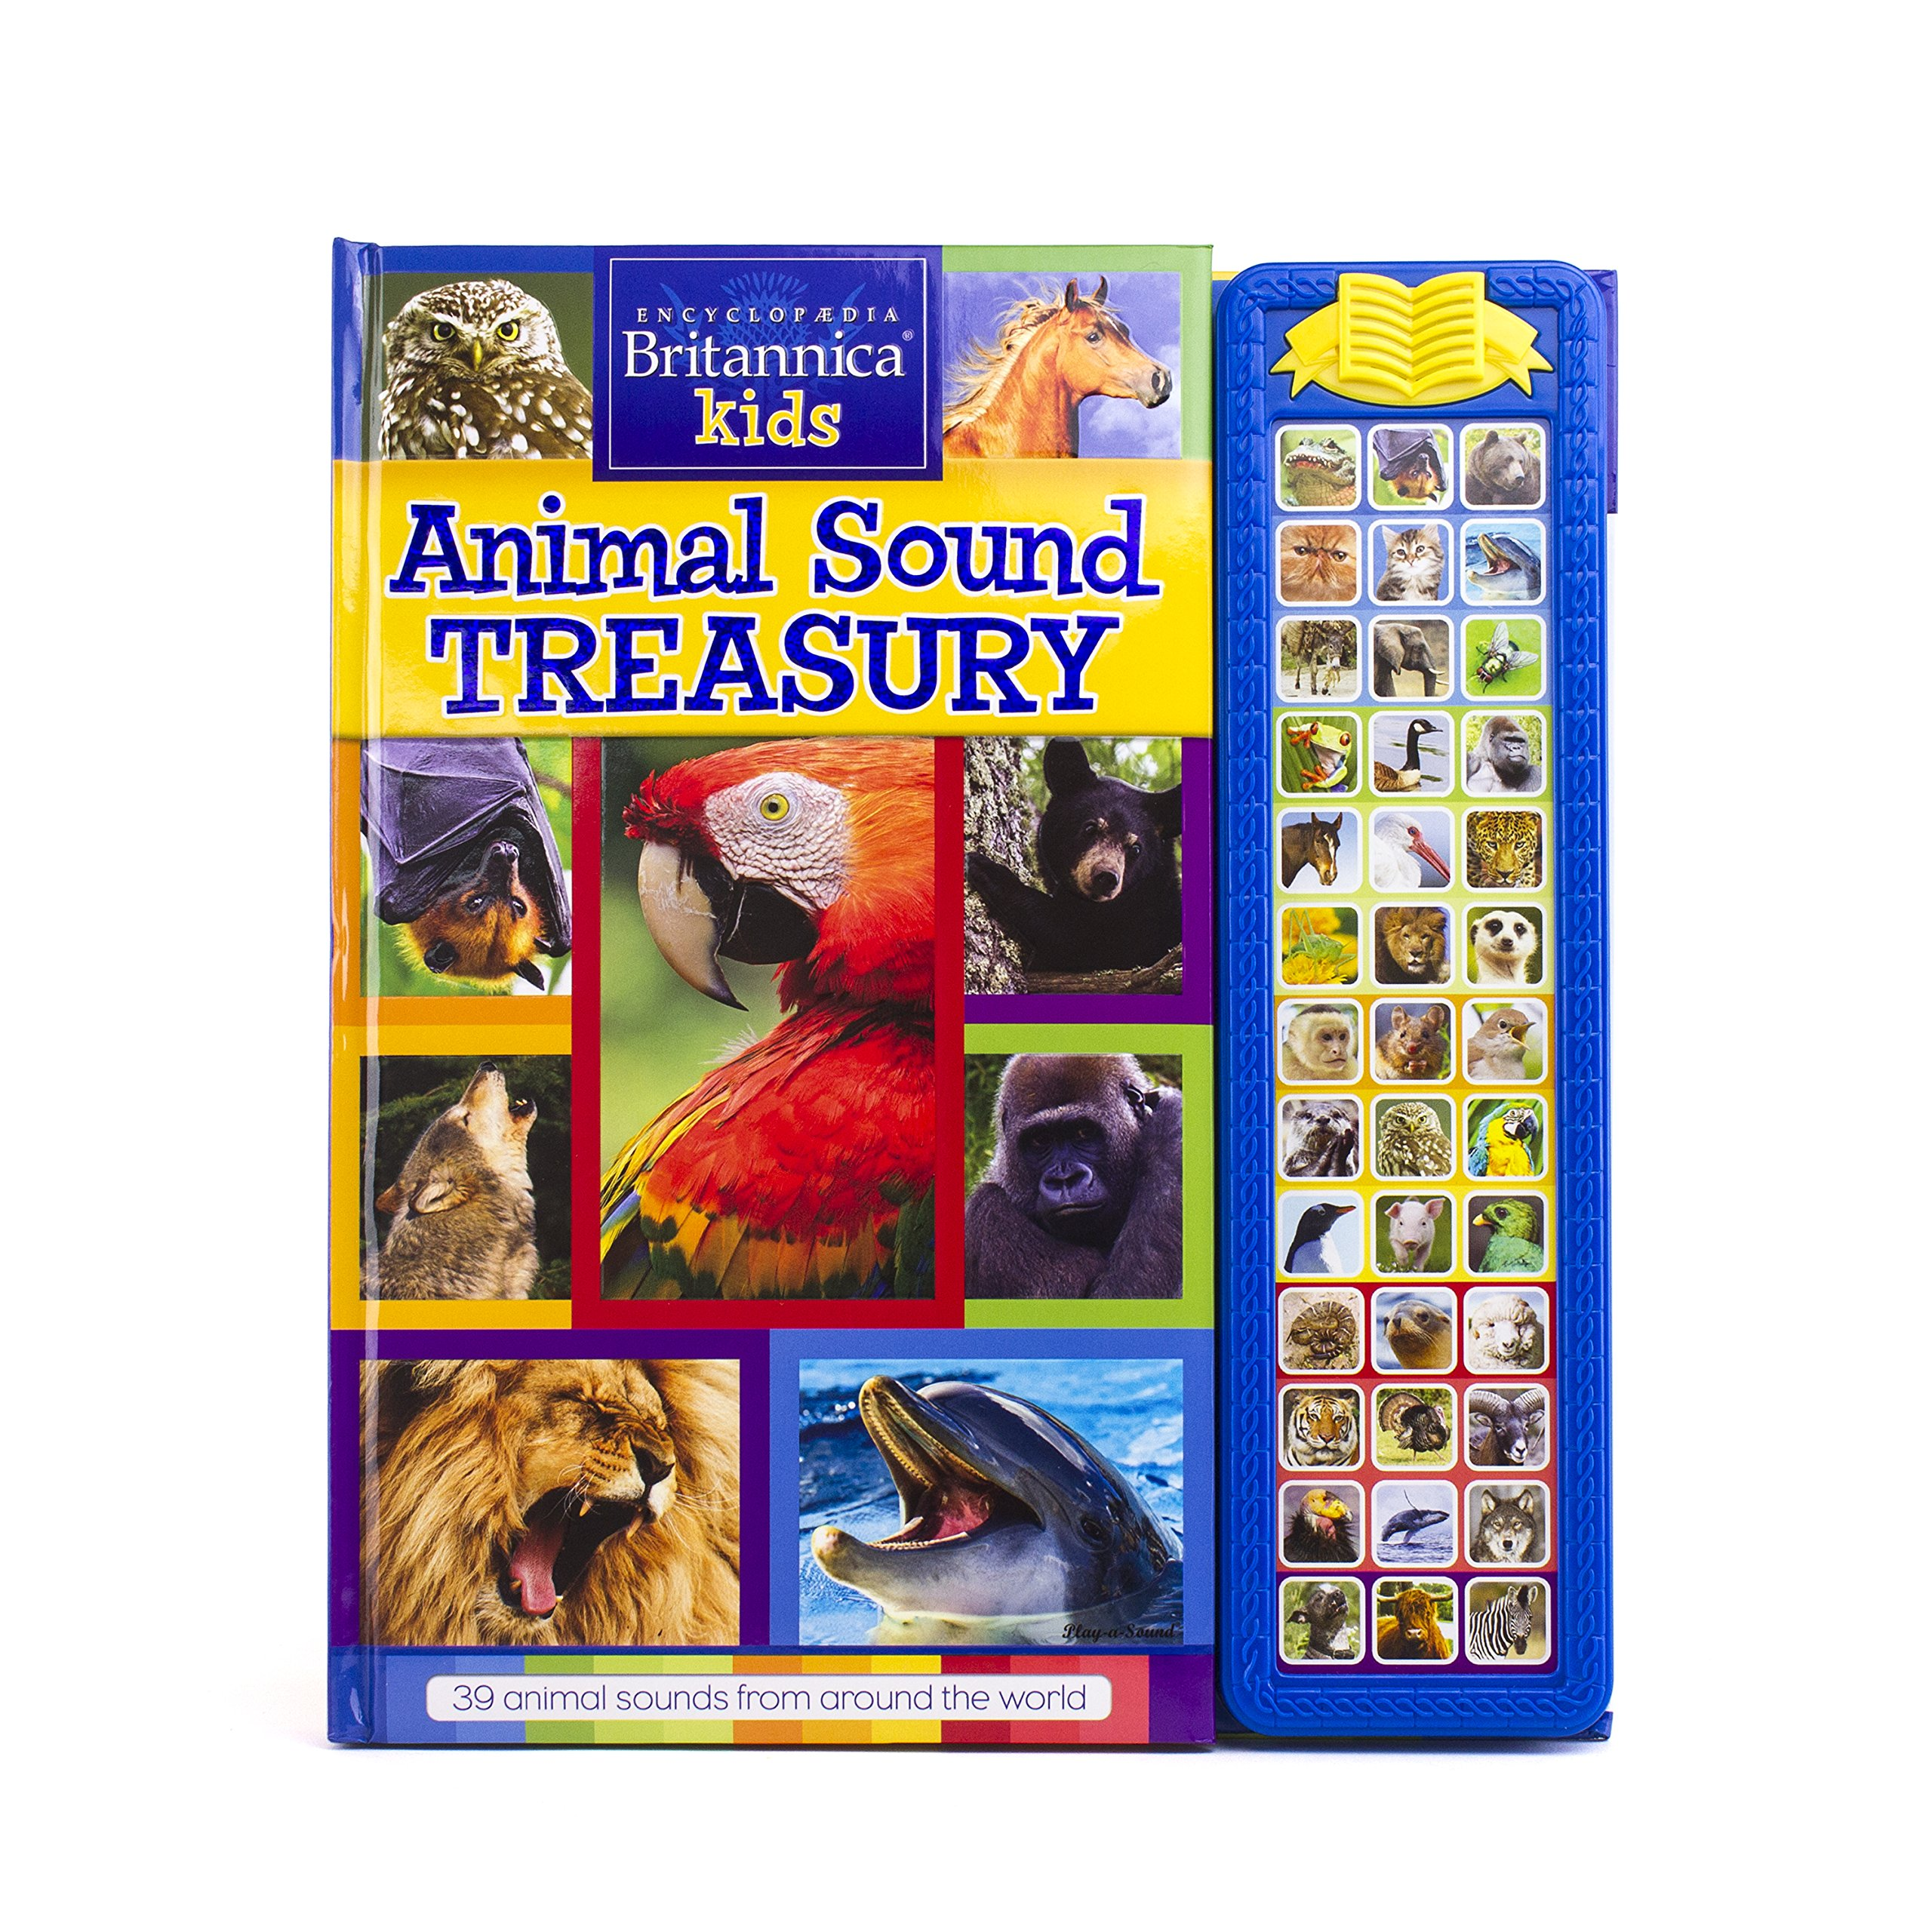 Encyclopedia Britannica Kids - Animal Sound Treasury Book - PI Kids